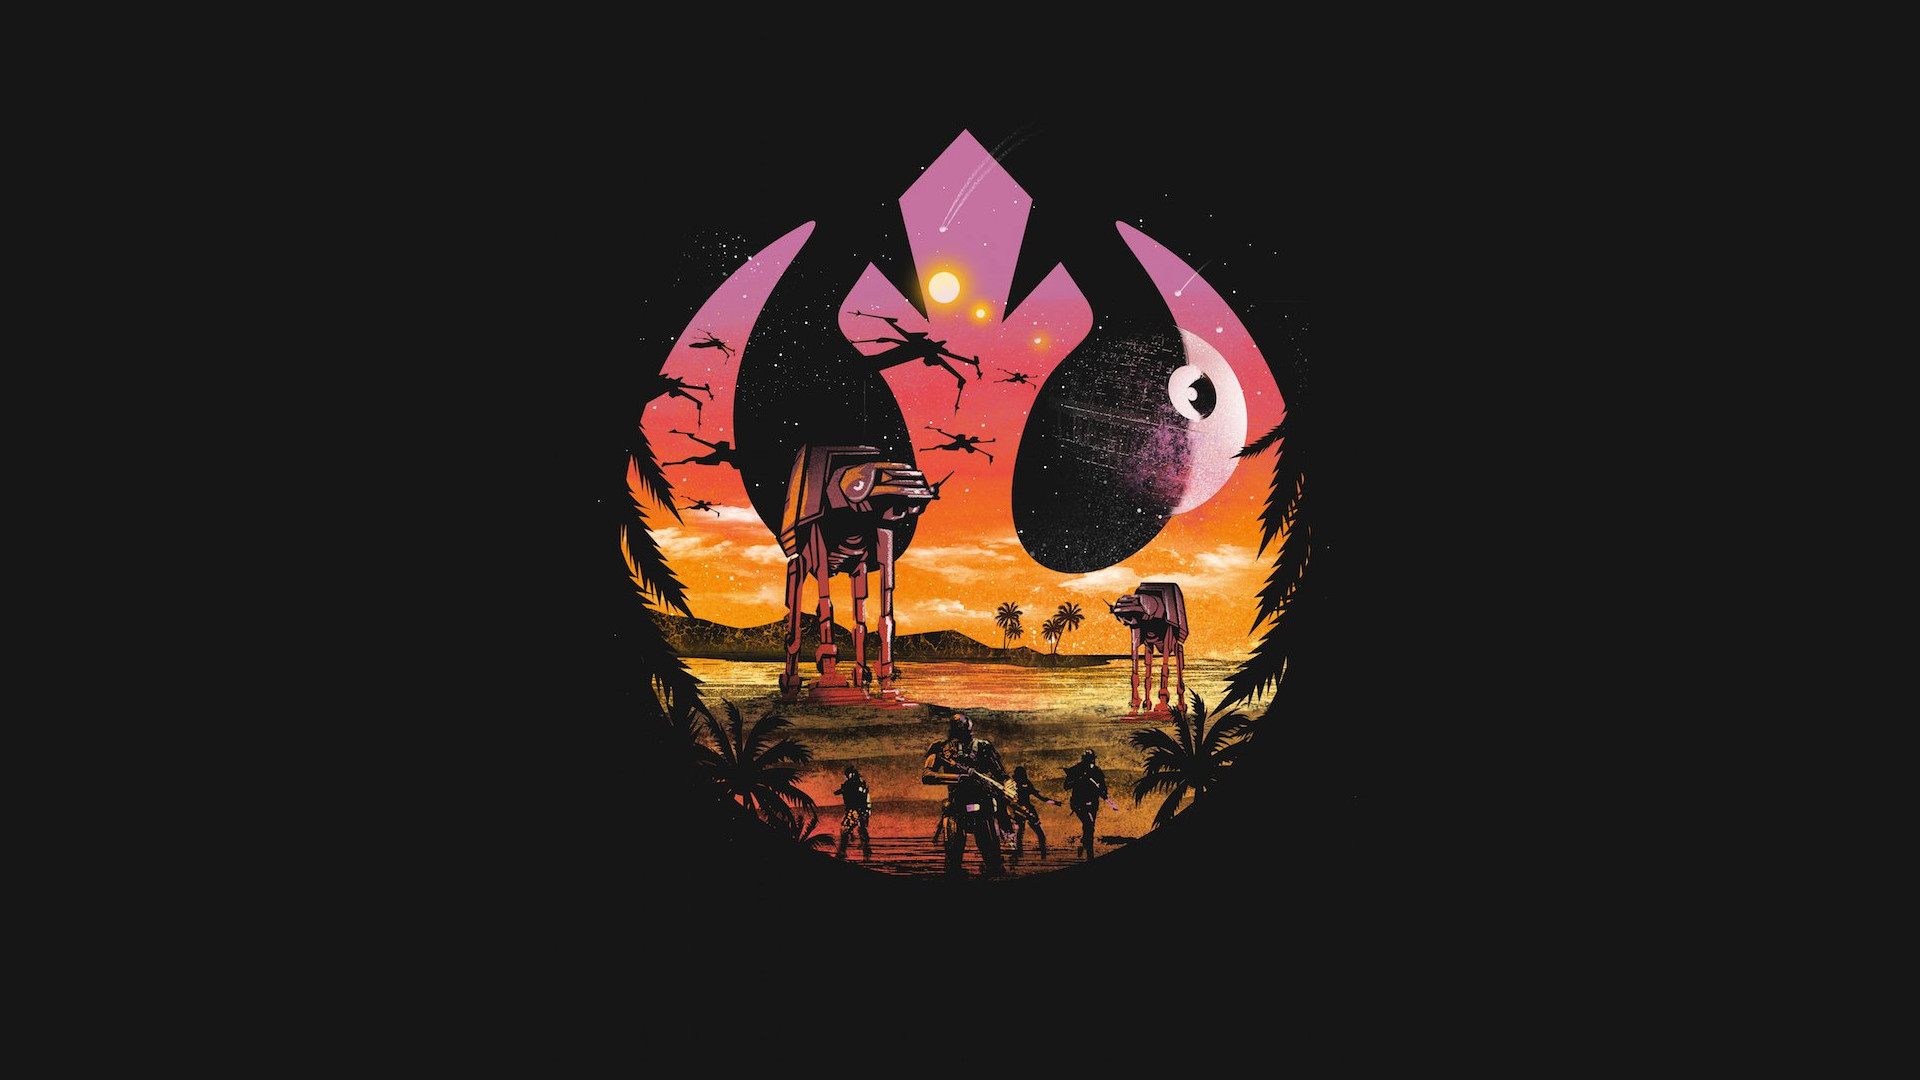 Darth Vader Iphone Wallpaper Hd Star Wars Rebels Hd Wallpapers 84 Images